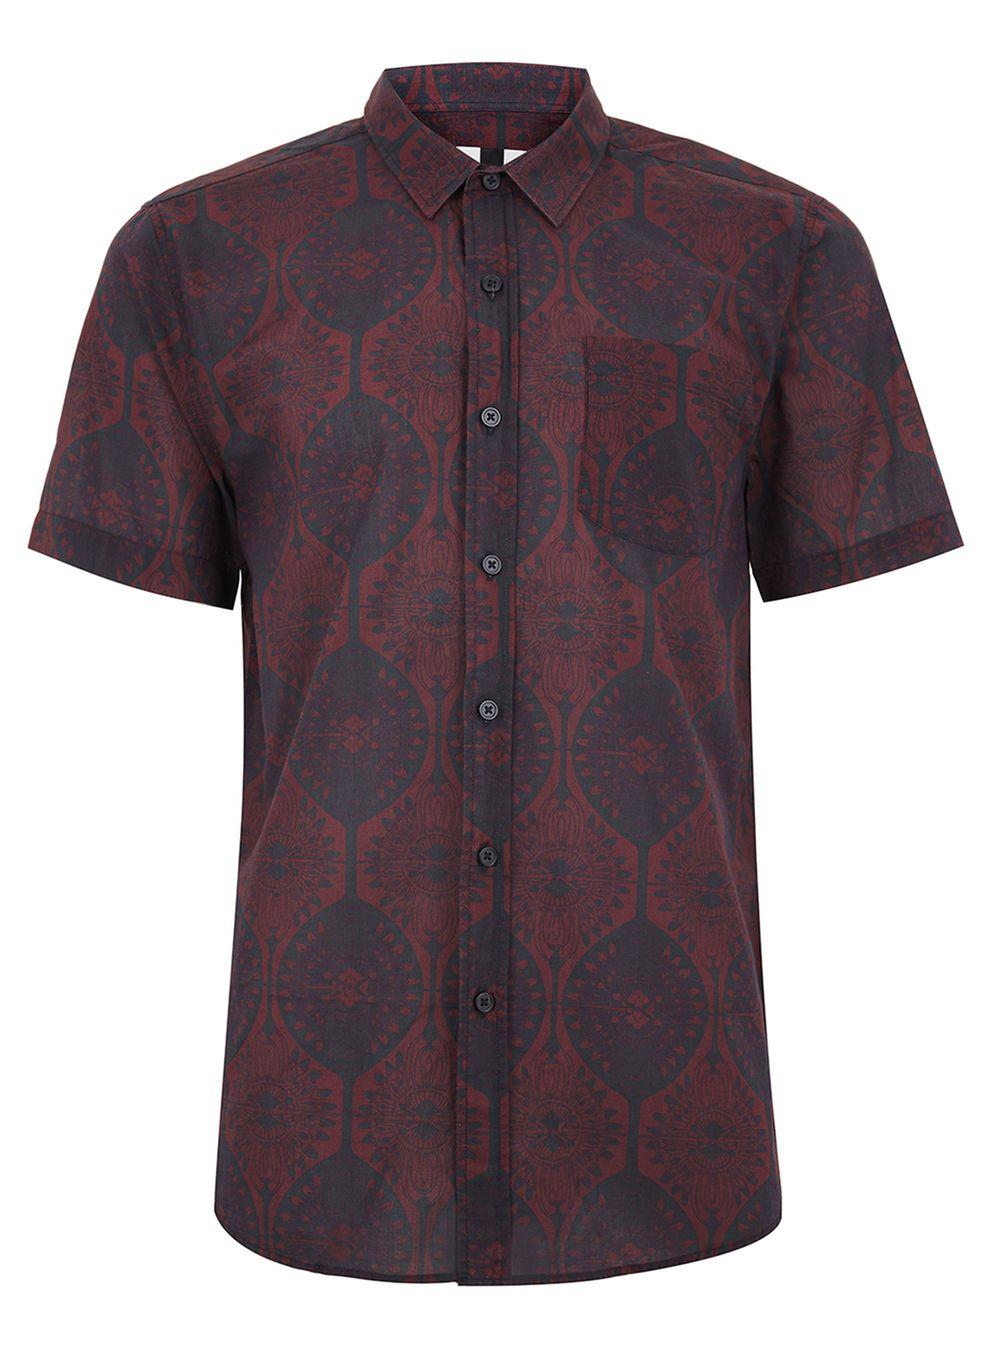 Topman men's Art deco Burgandy button down shirt